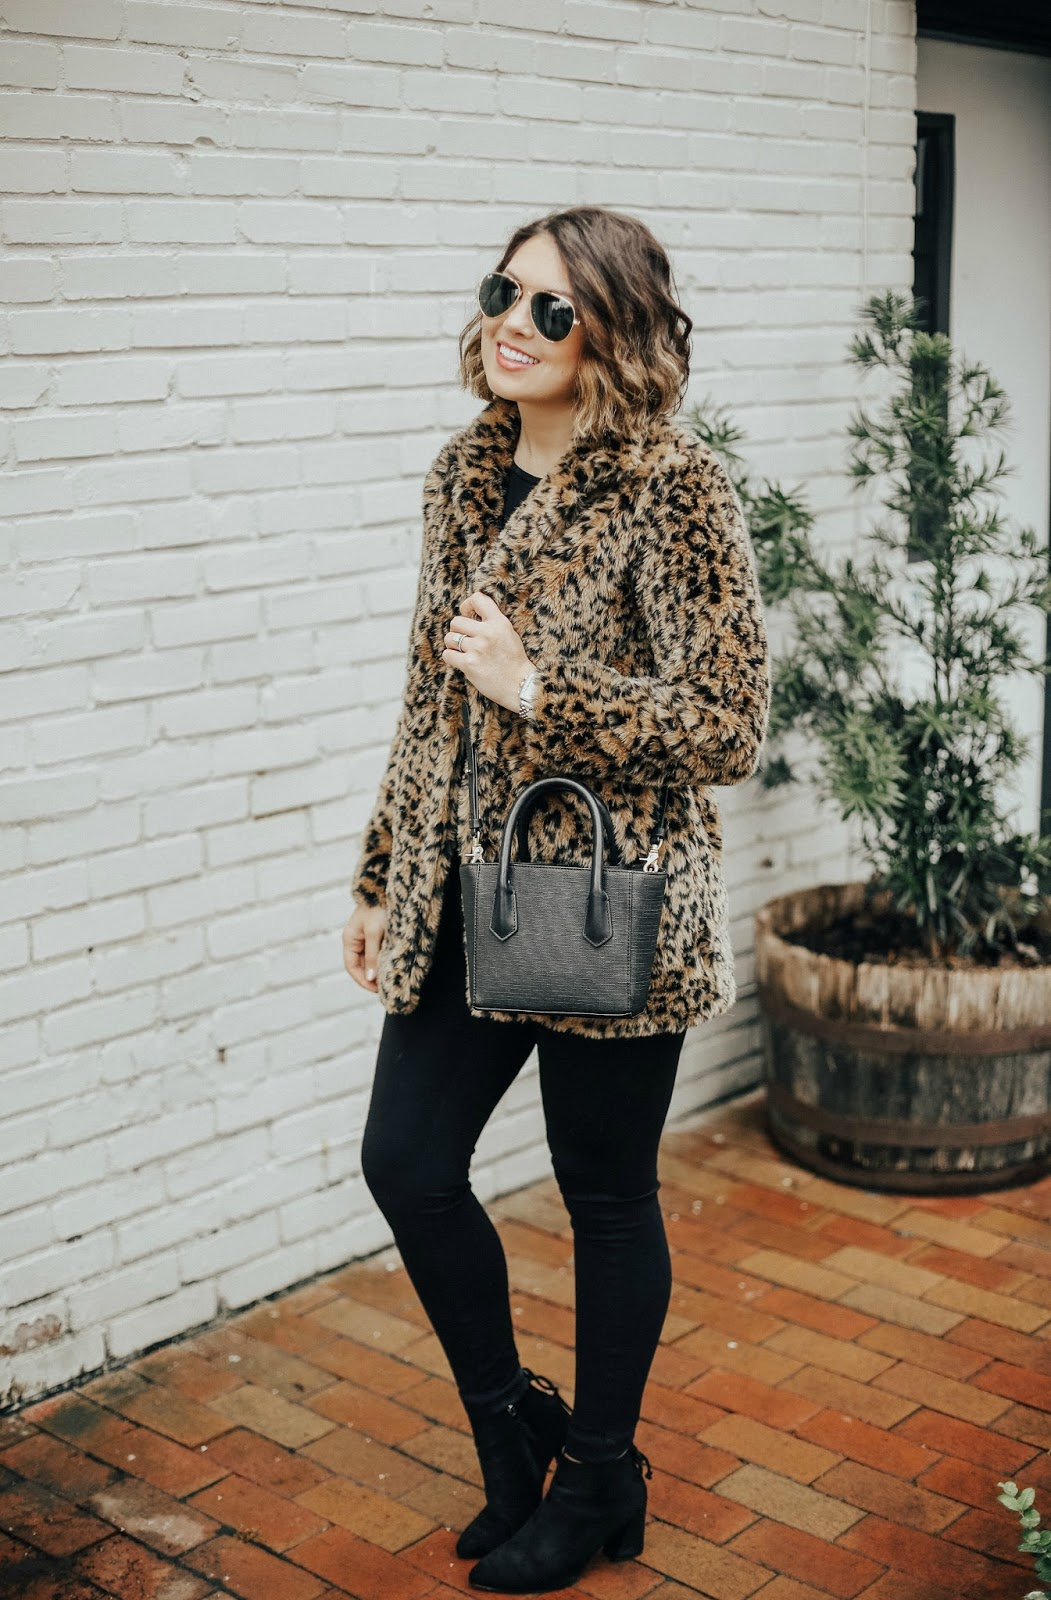 budget leopard coat, xo samantha brooke, life and messy hair, samantha brooke, j crew ponte pant